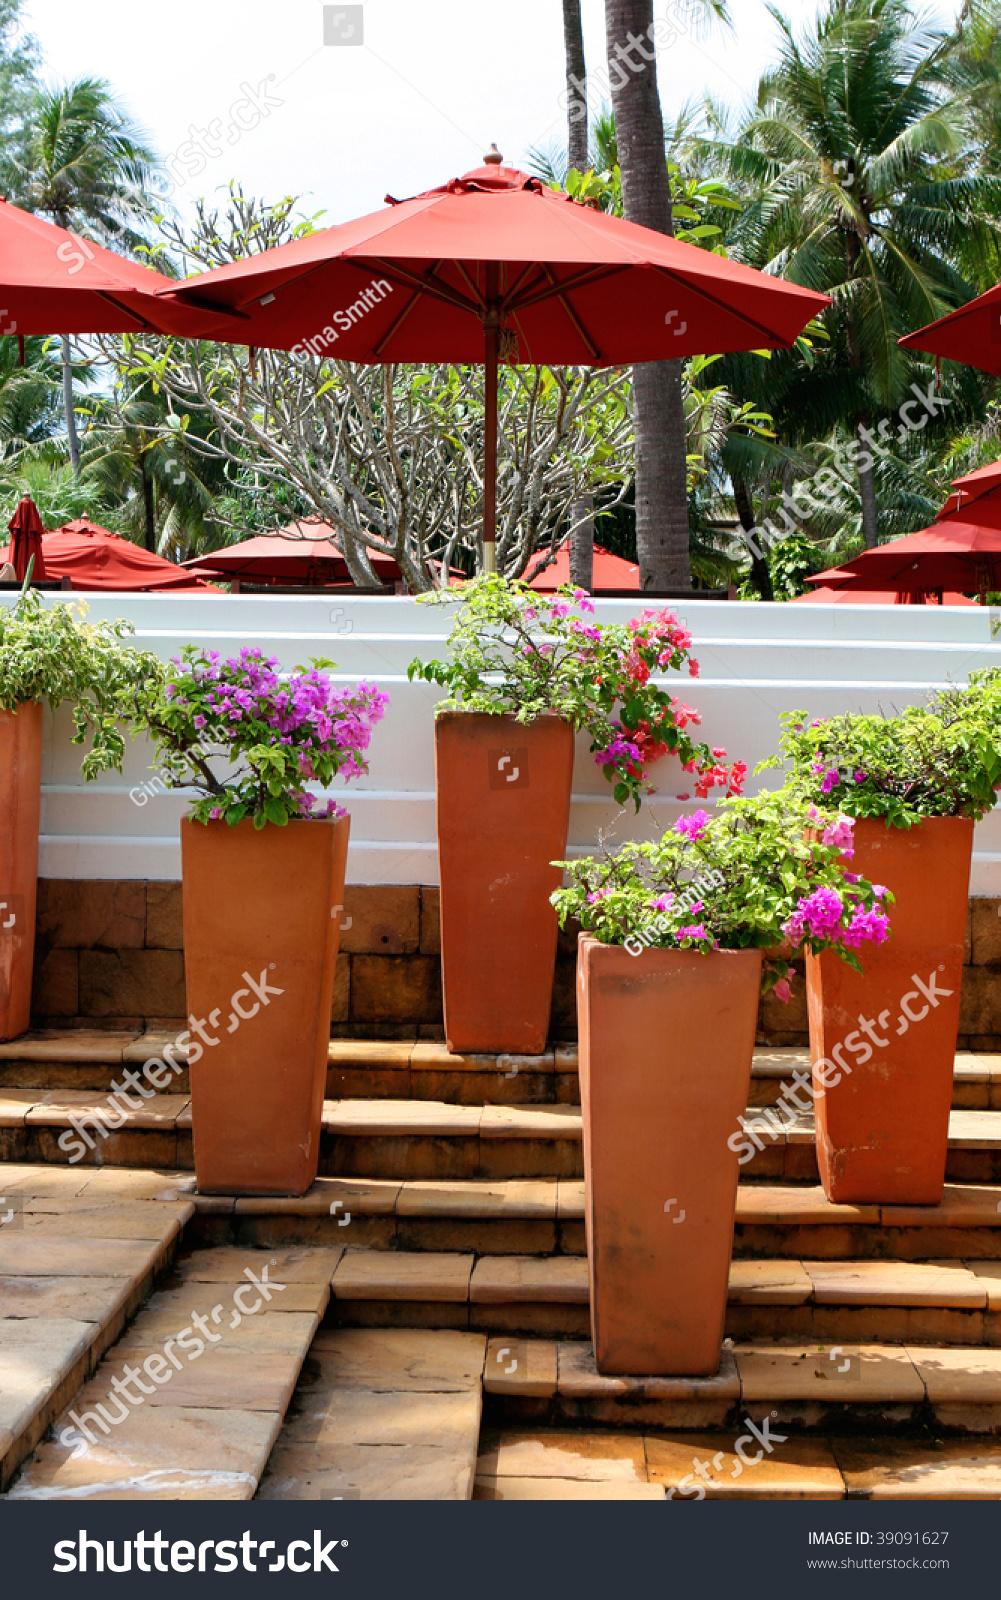 Beautiful Flower Pots Decorating Swimming Pool Transportation Stock Image 39091627